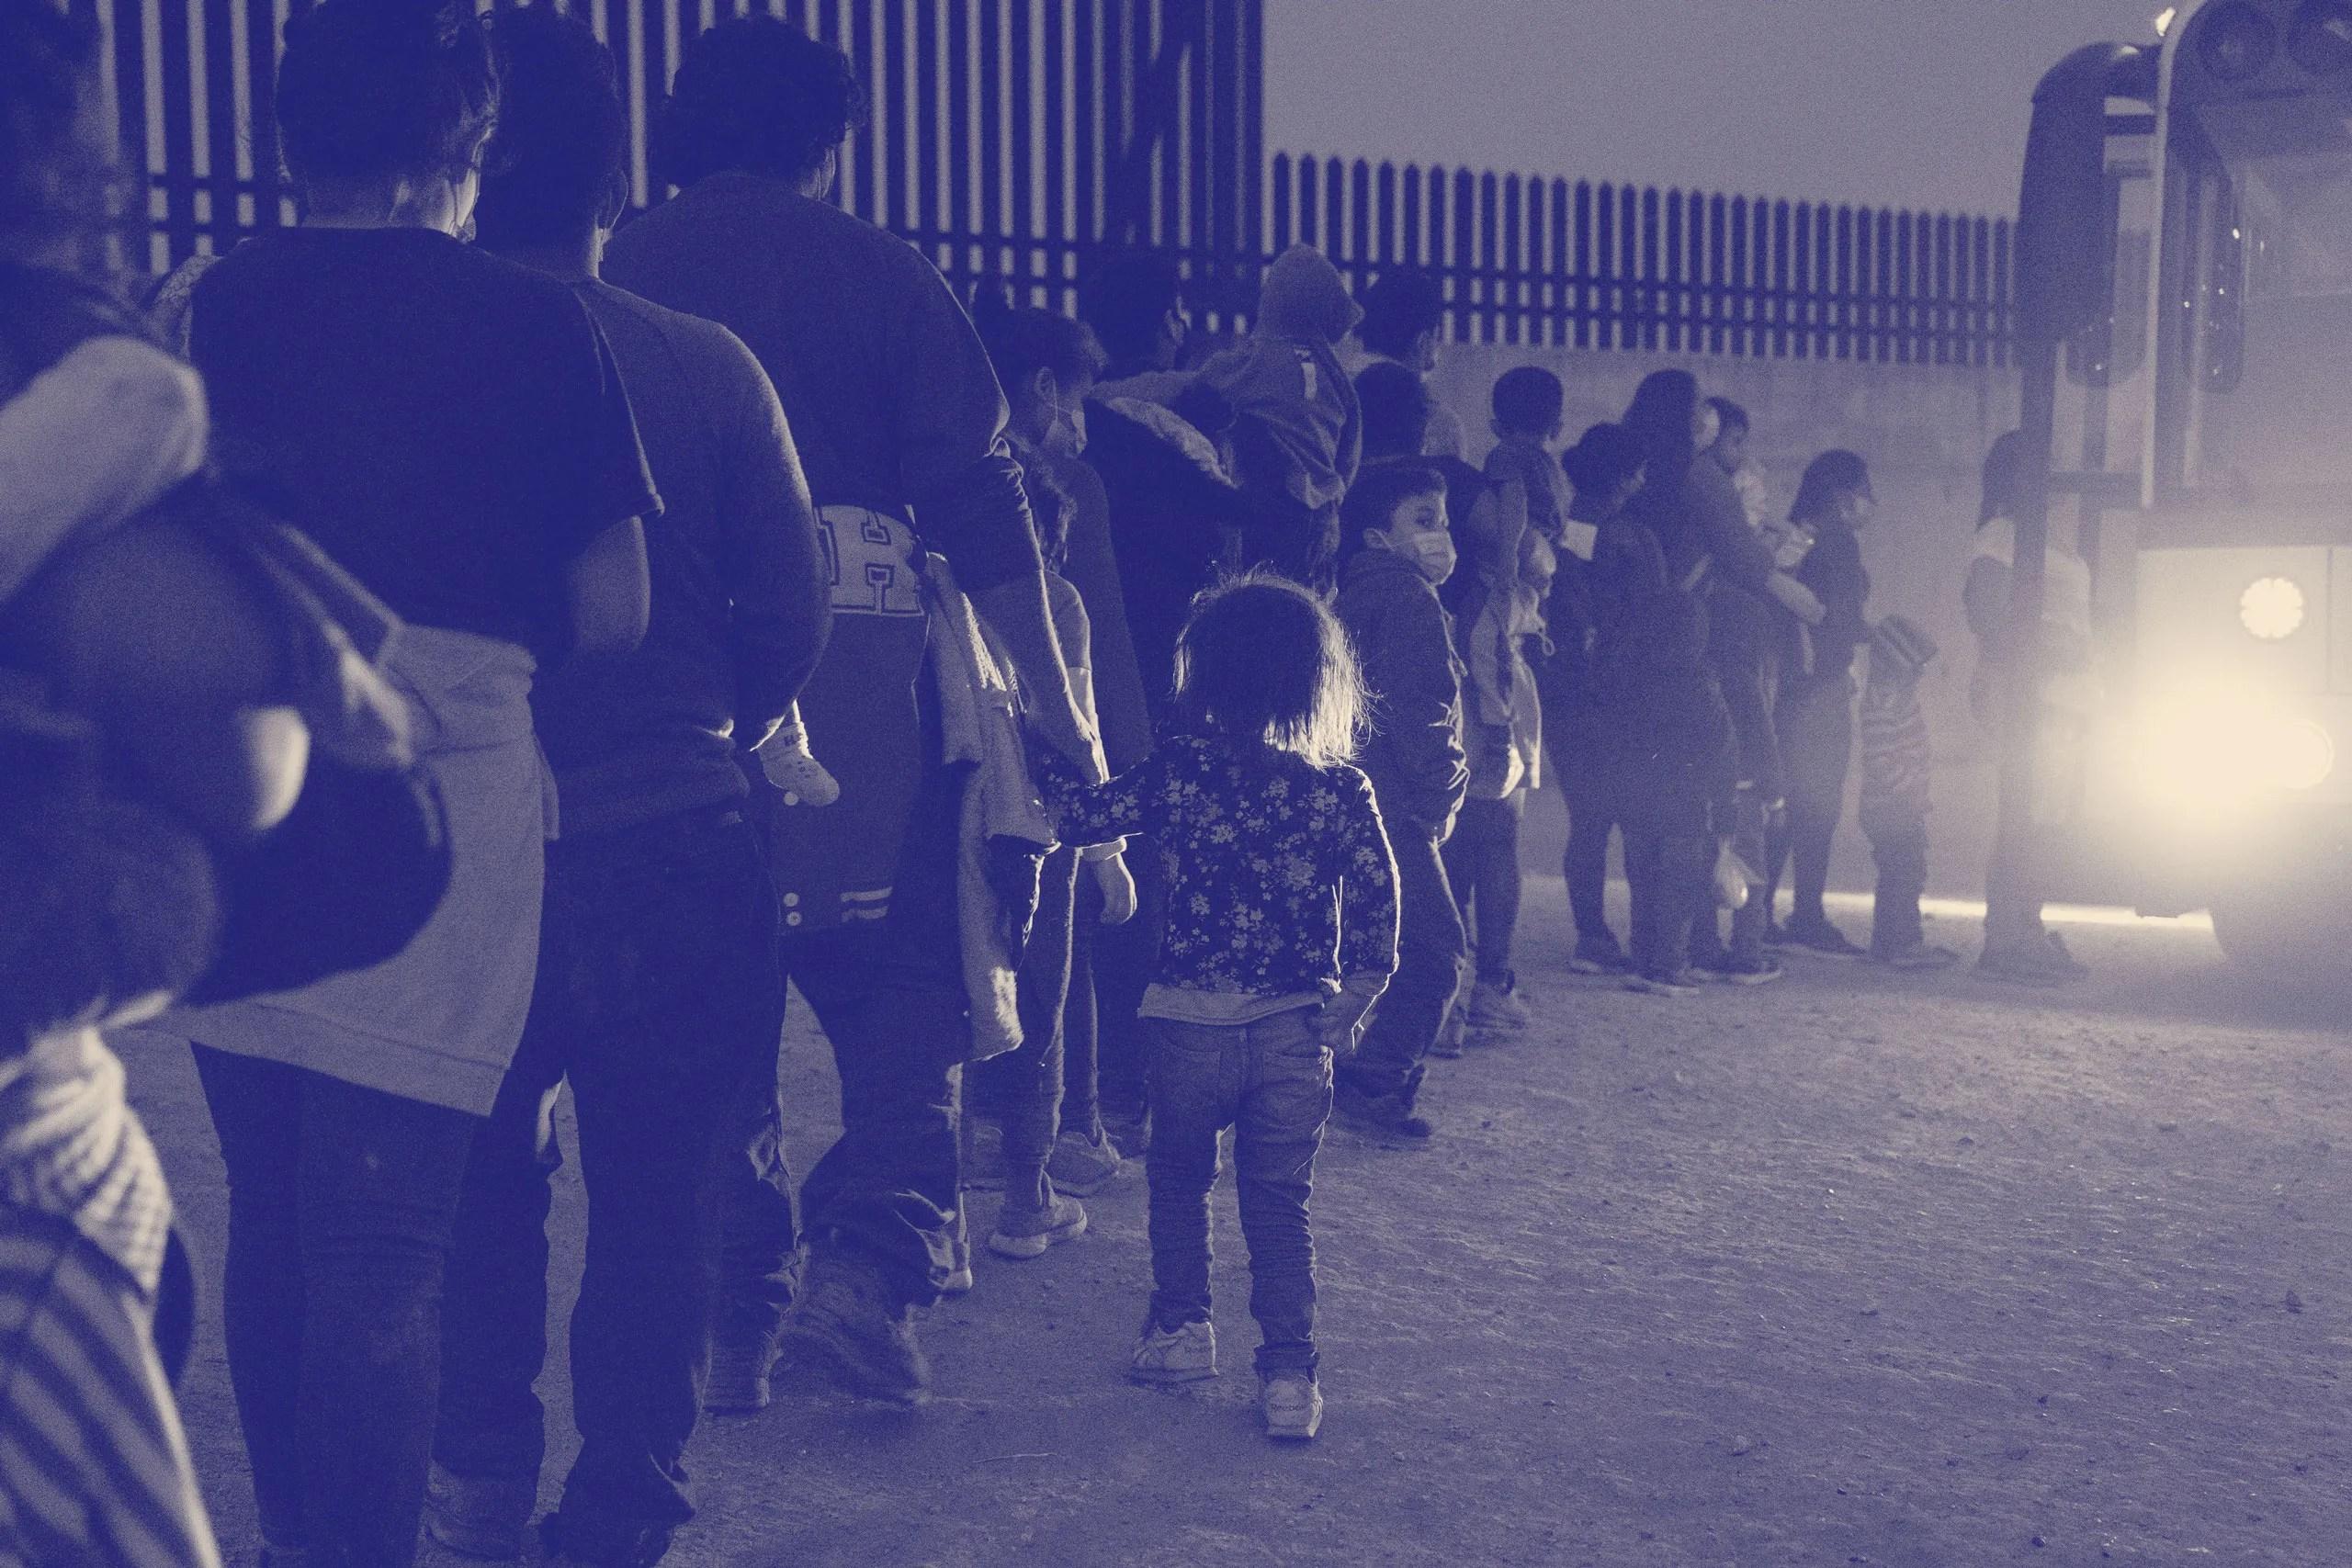 Asylumseeking migrants' families make a line to board a bus